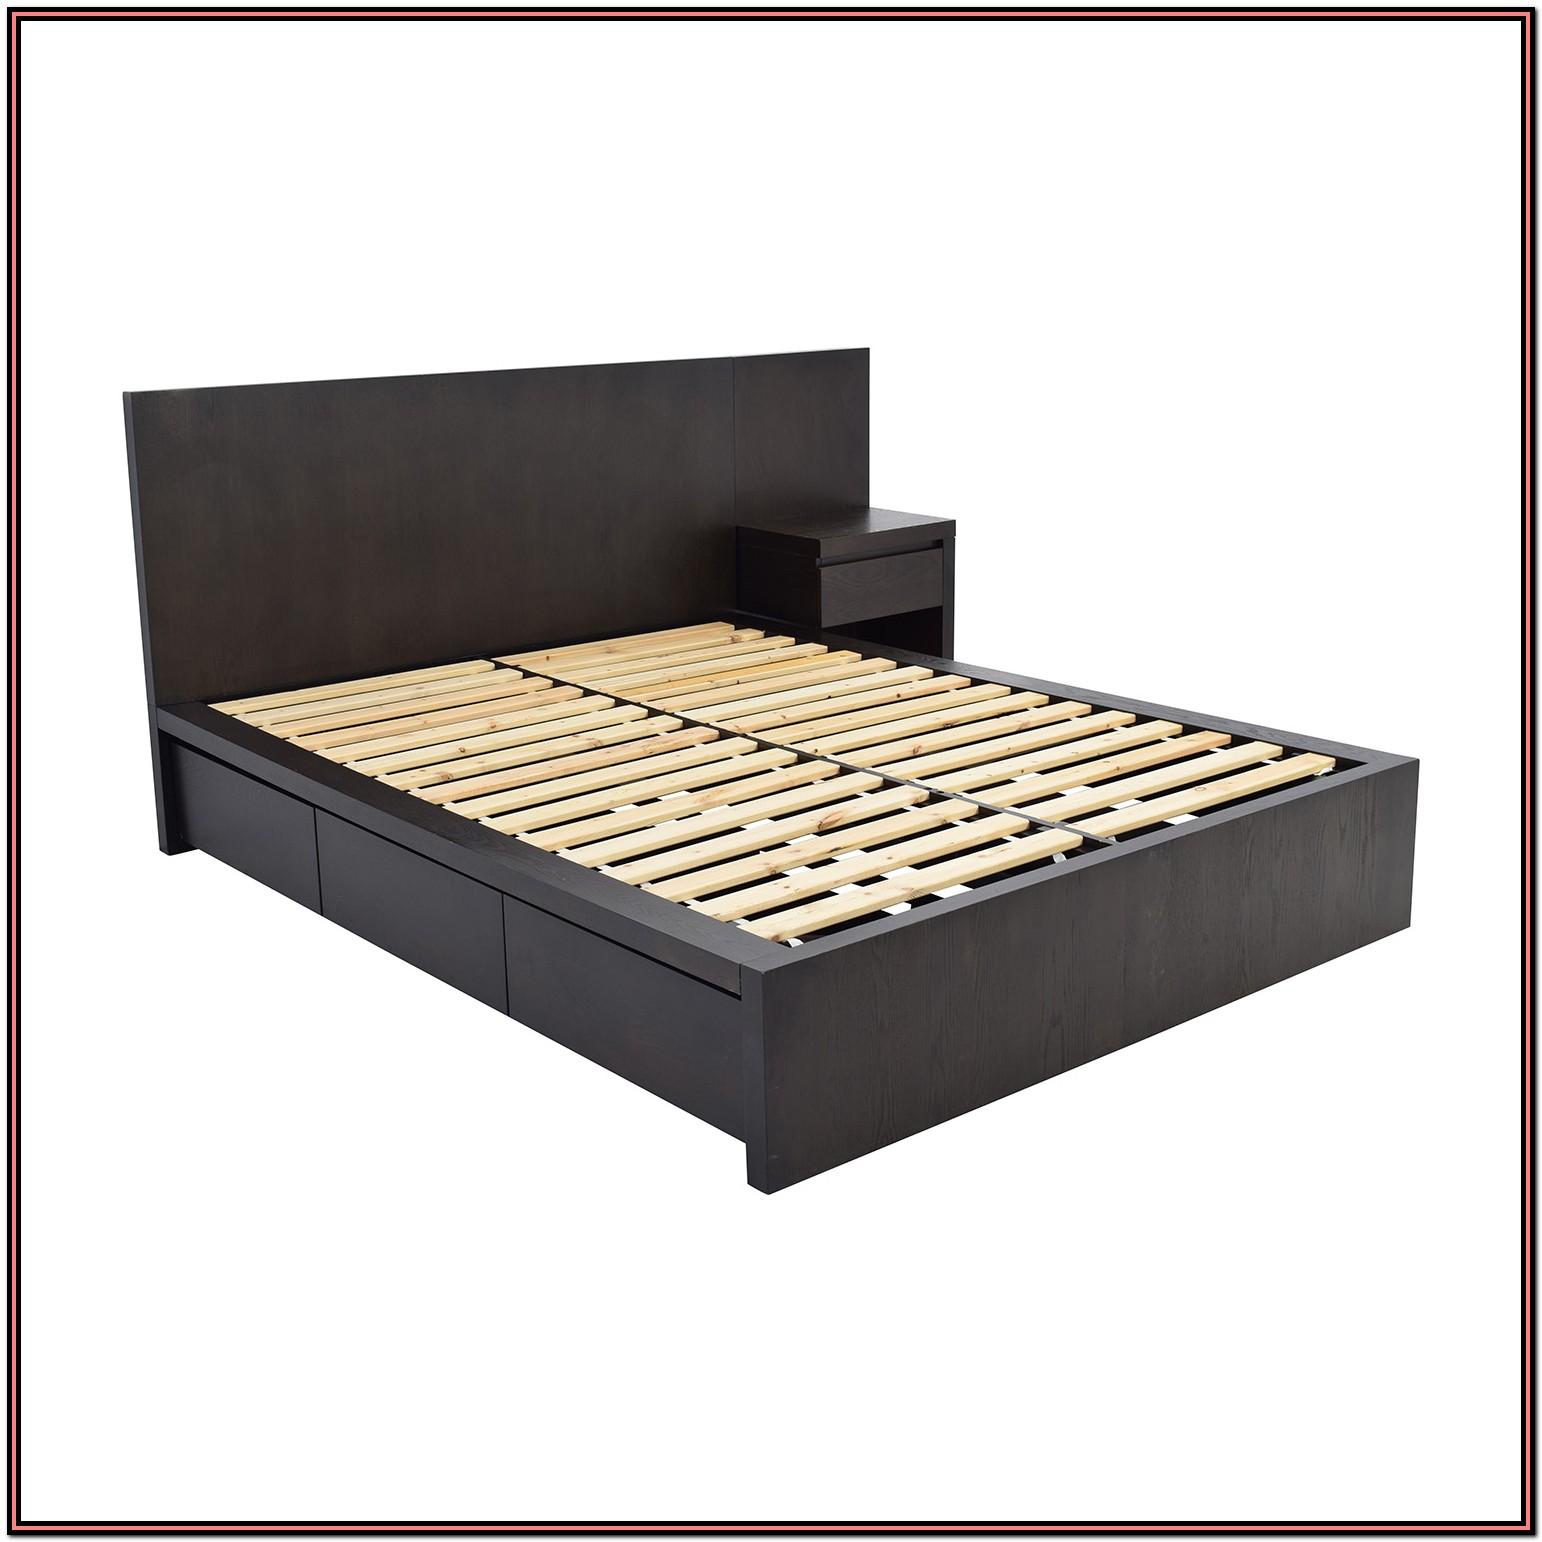 Queen Platform Beds With Storage And Headboard